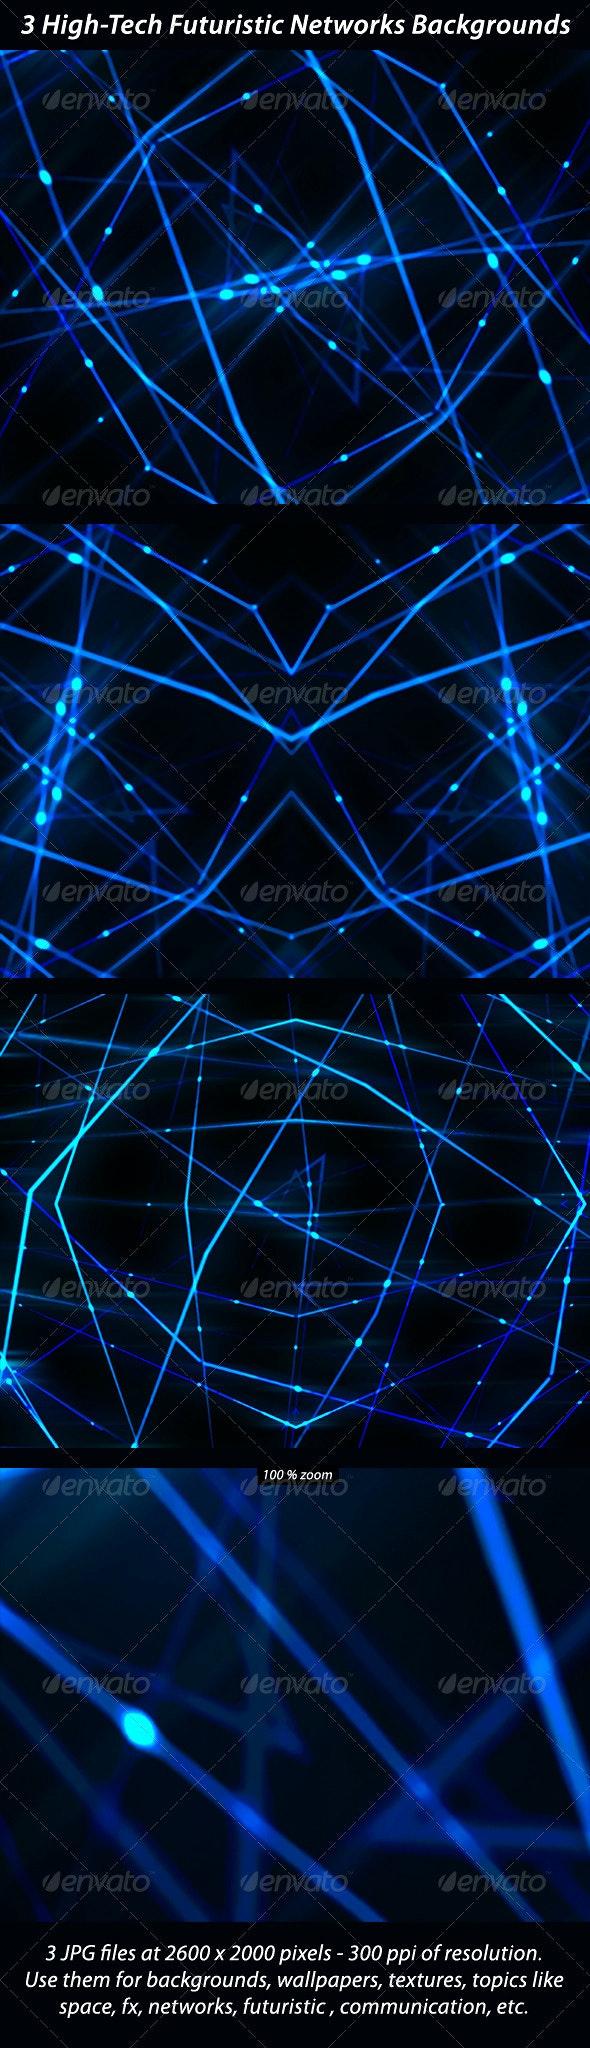 3 High Tech Futuristic Networks Backgrounds - Tech / Futuristic Backgrounds